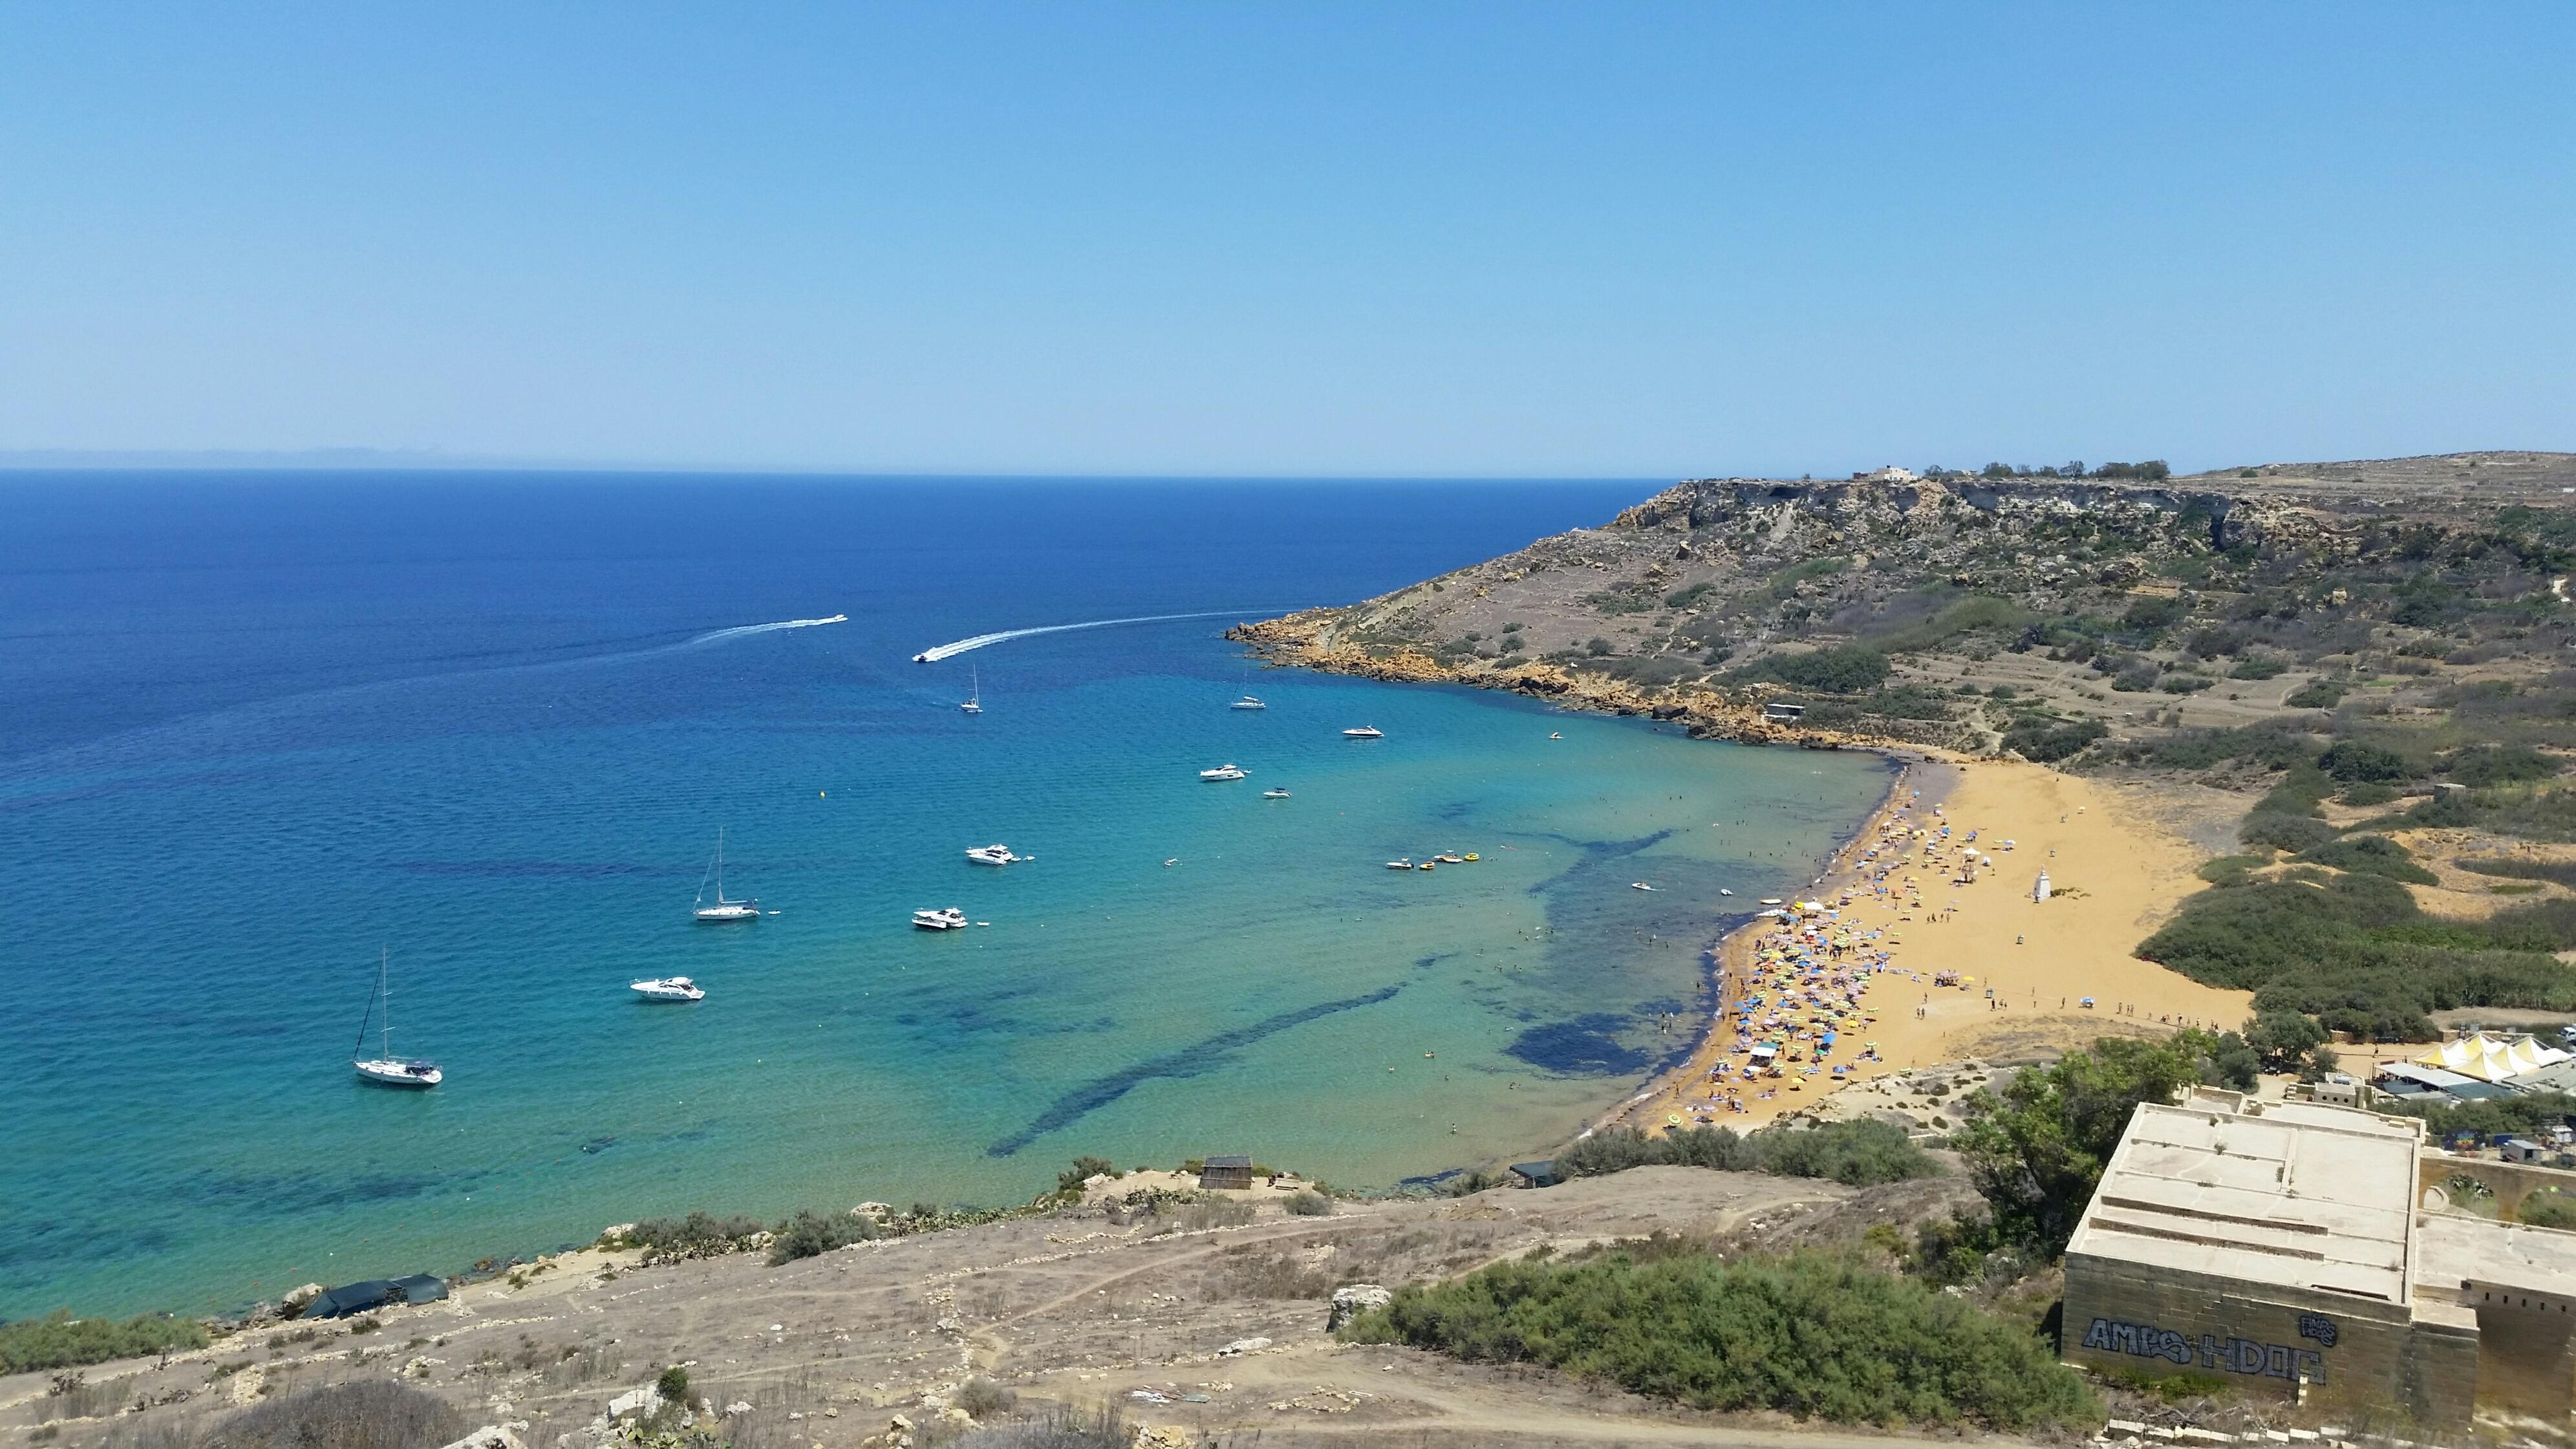 GSE Malta Ramla Bay in Gozo - Gozo's finest sandy beach